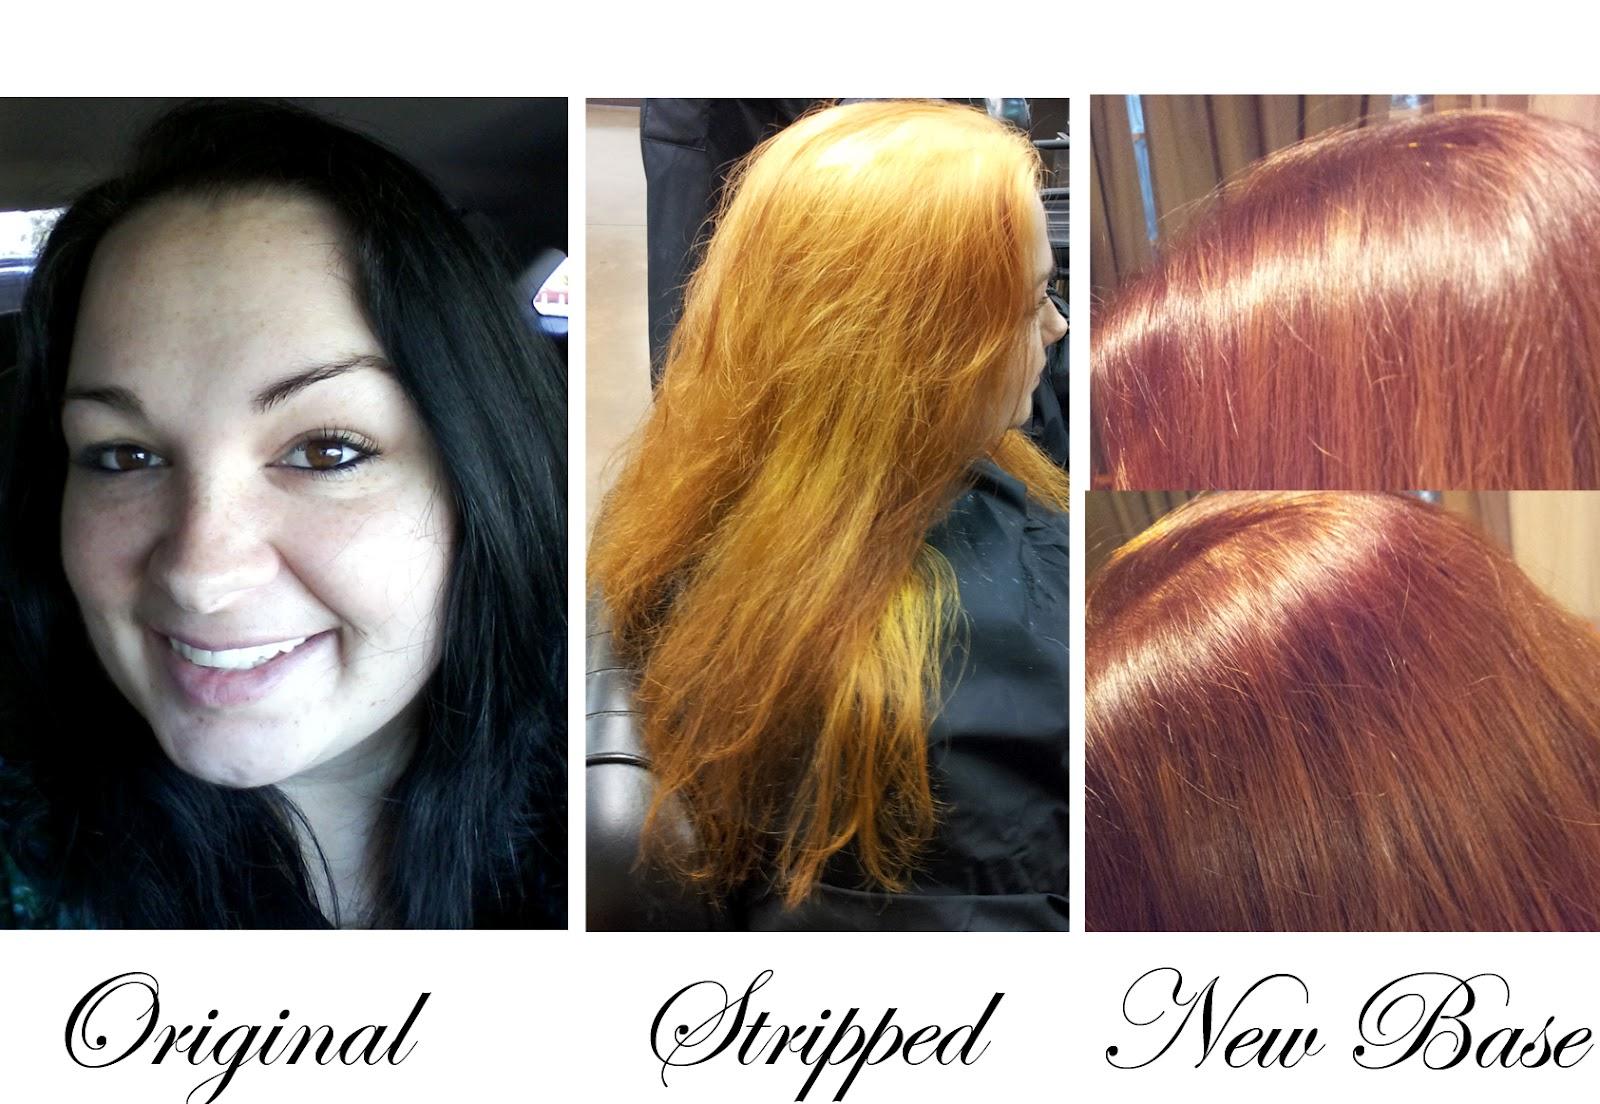 http://3.bp.blogspot.com/-l-SSZ3xaPOk/UC2ykKiUsYI/AAAAAAAAADU/CBh_TEsxv4o/s1600/new+hair+copy.jpg